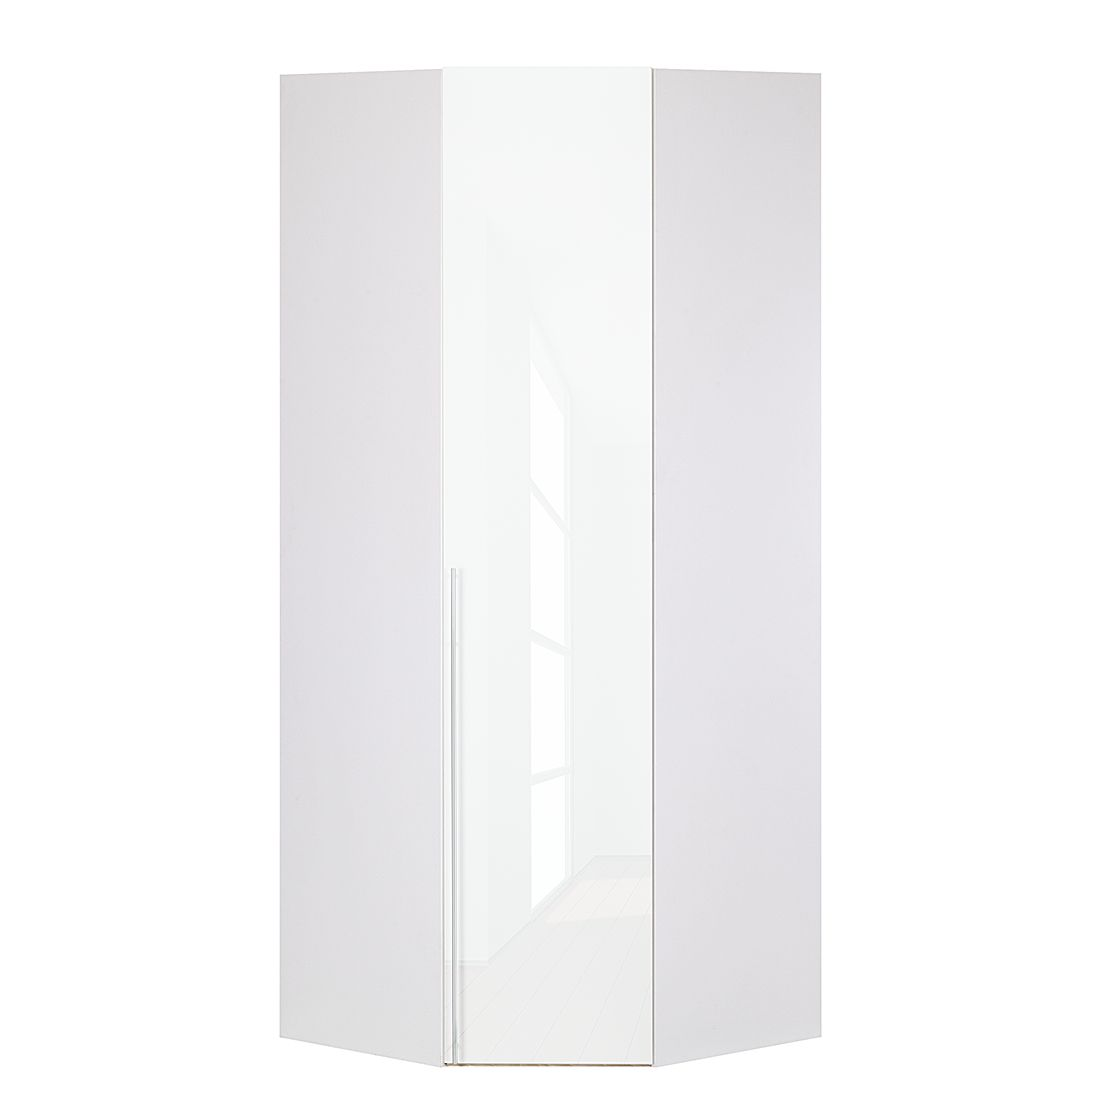 Armoire d'angle Brooklyn VI - Blanc polaire / Laqué blanc - 216 cm, Express Möbel